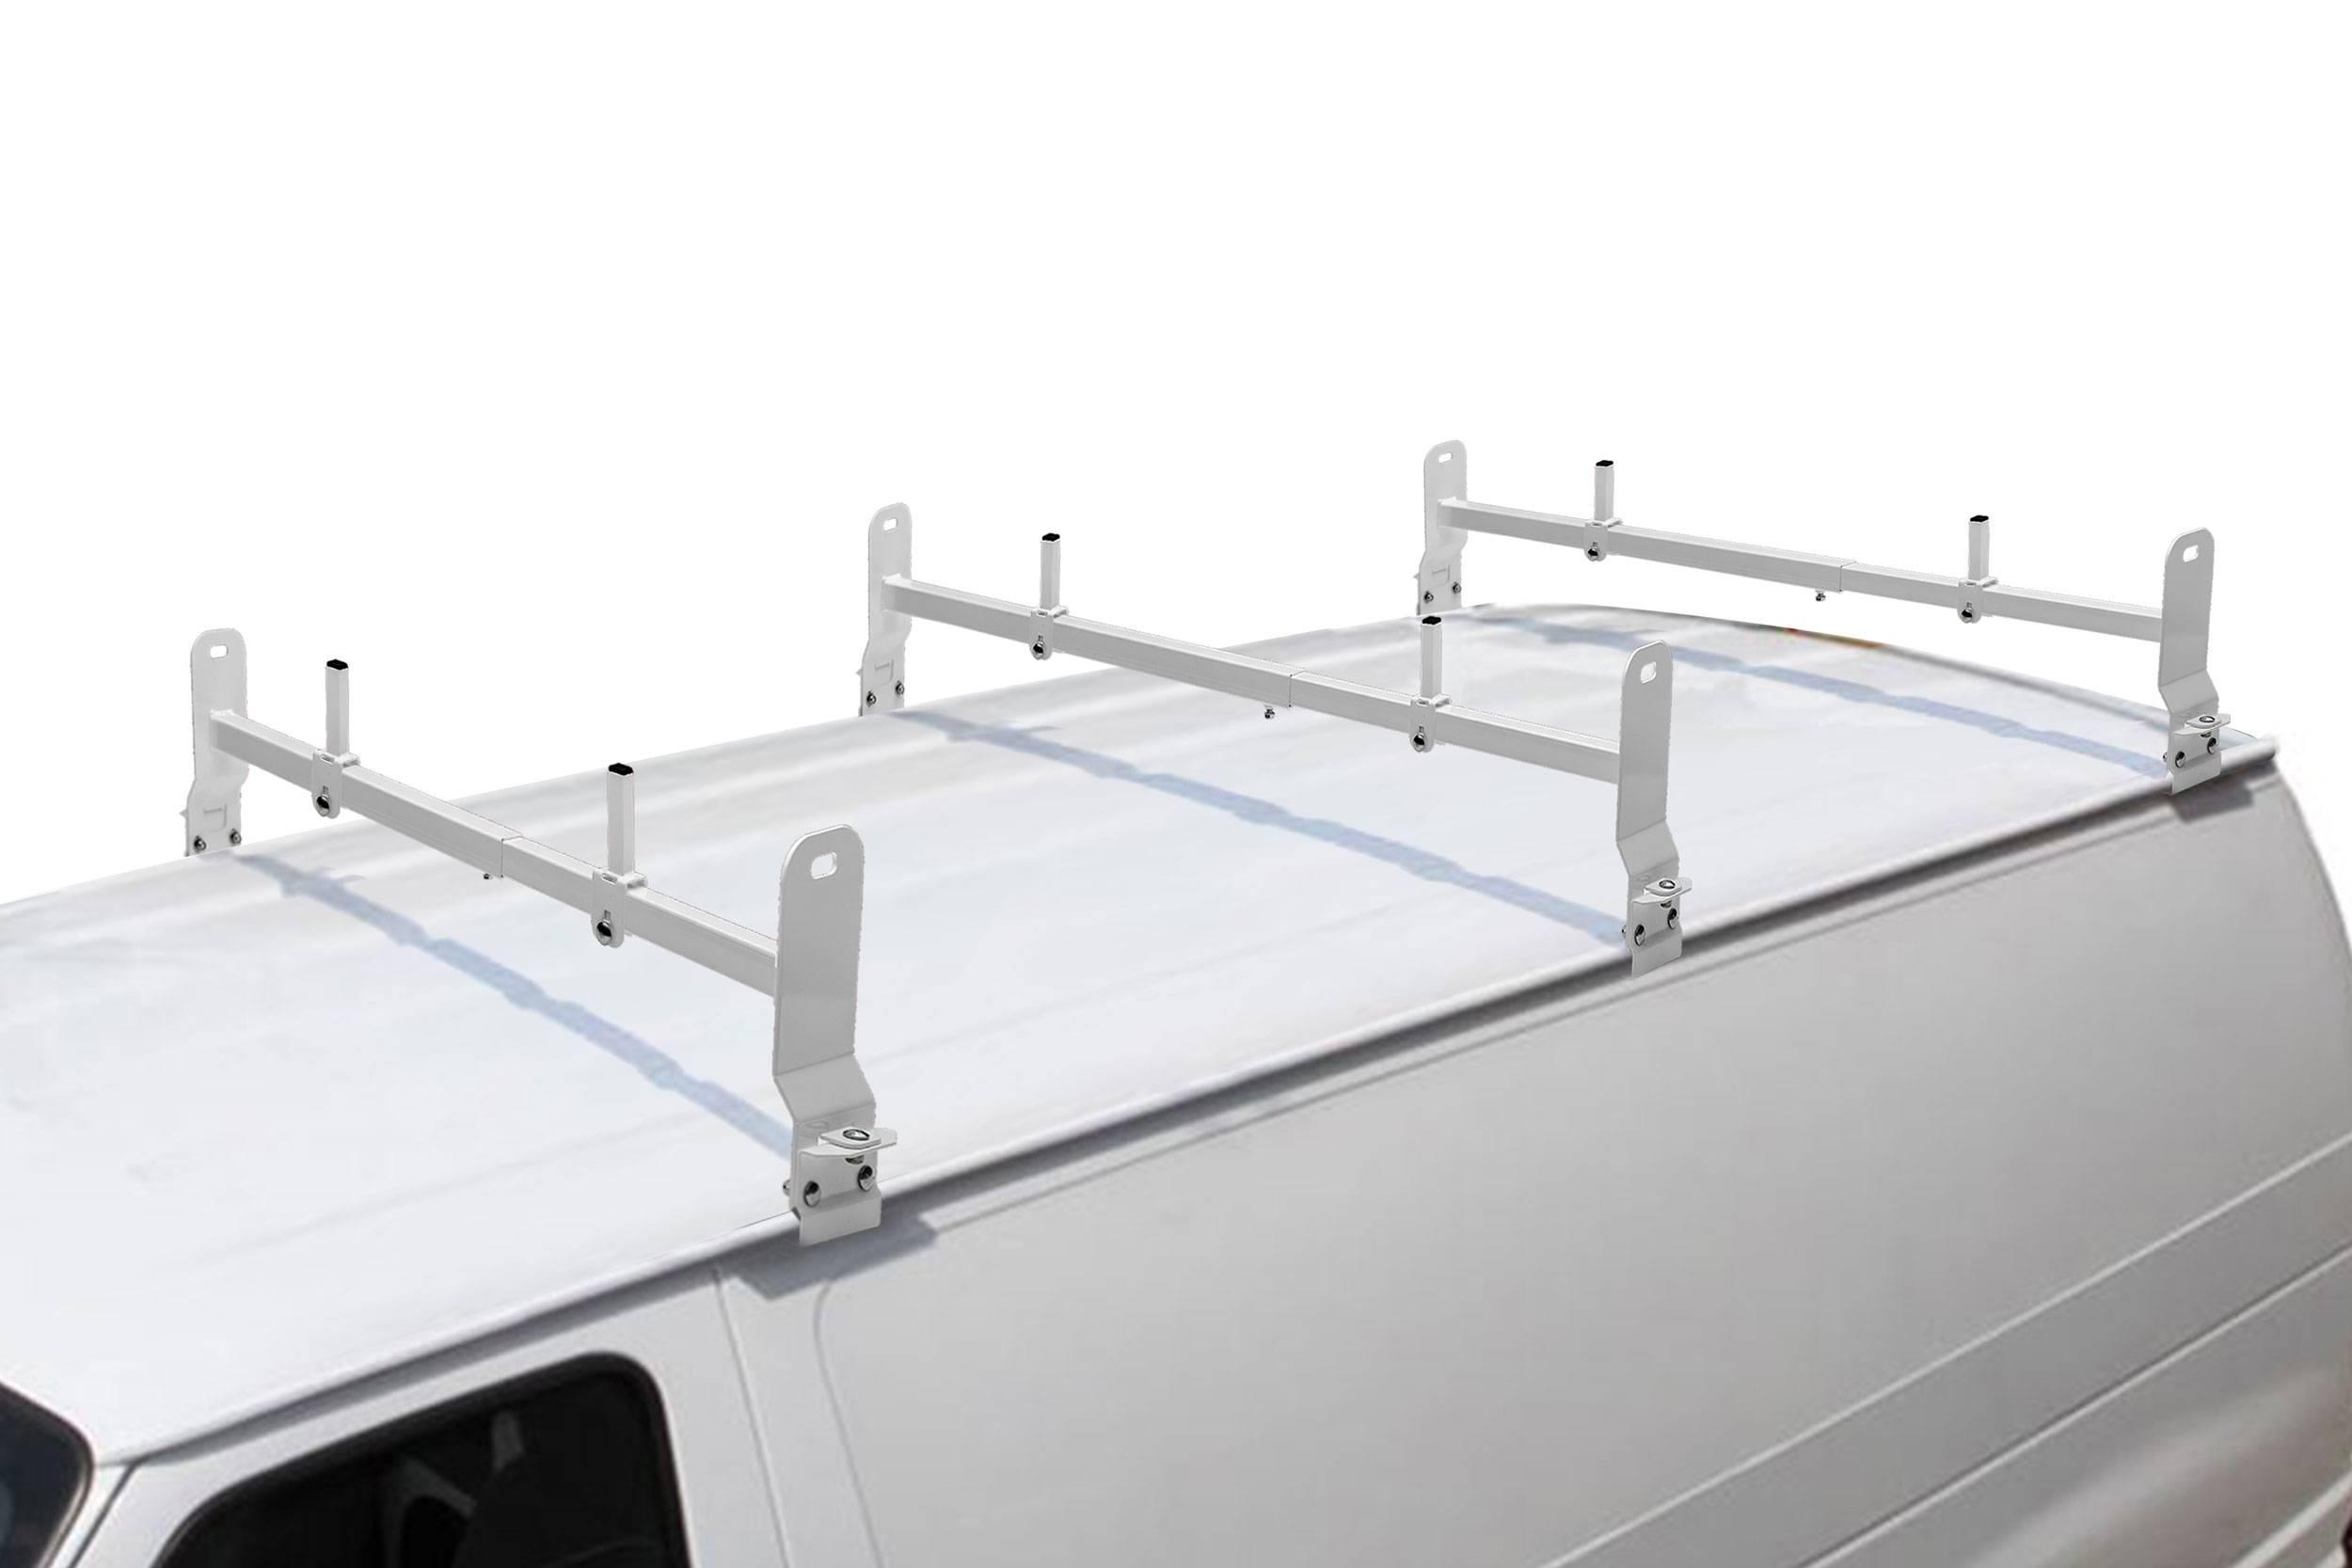 Van Rack, 3 pc, White, Clamp On Installation - PN #84630314